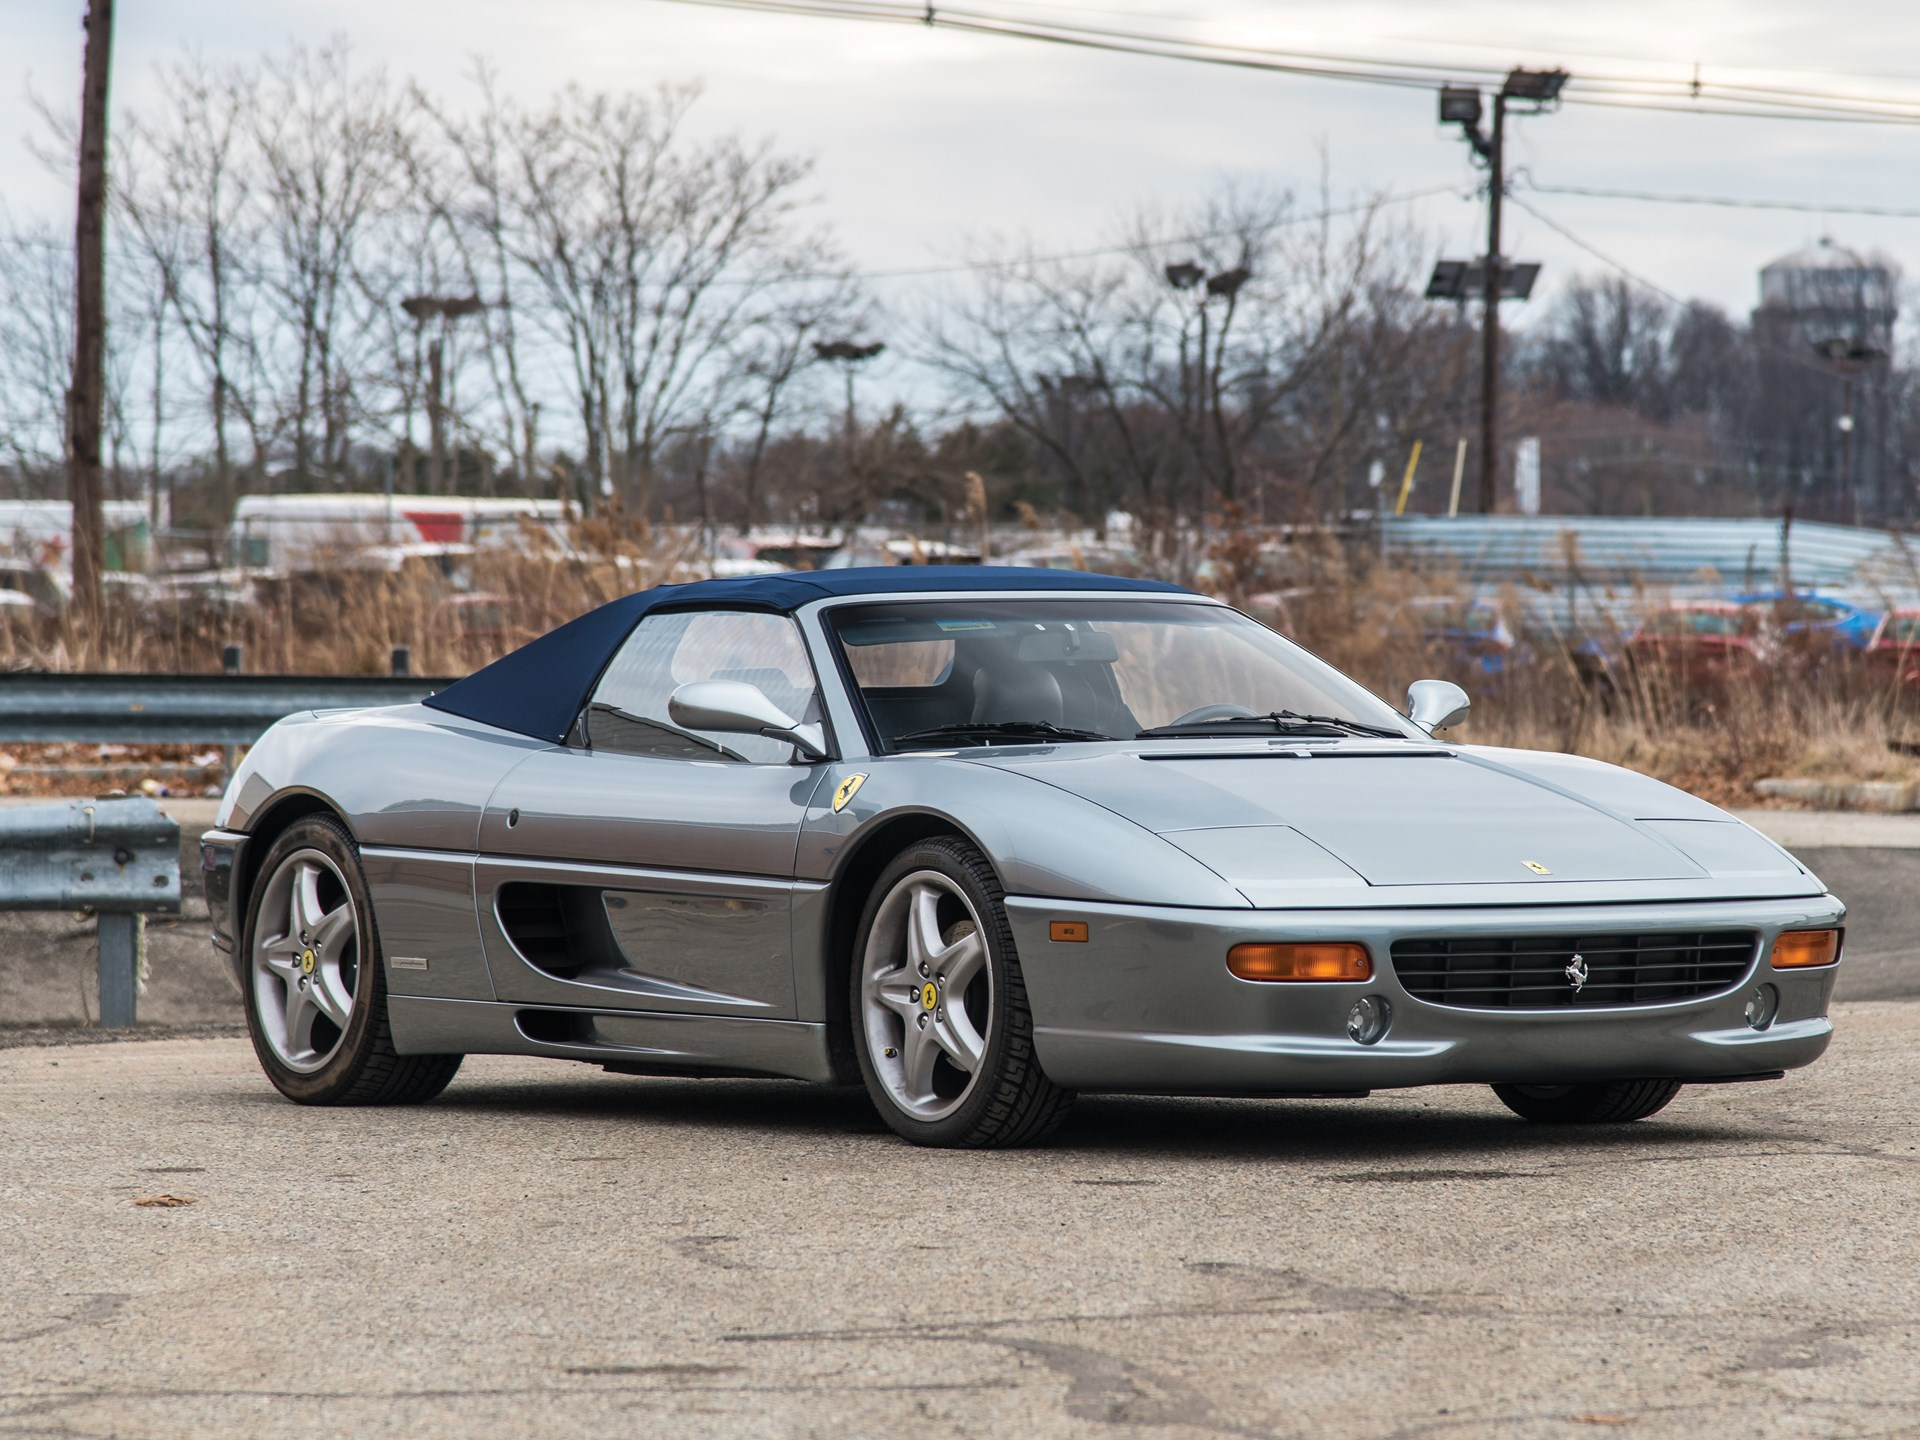 RM Sotheby's - 1999 Ferrari 355 F1 Spider 'Serie Fiorano' | Fort ...